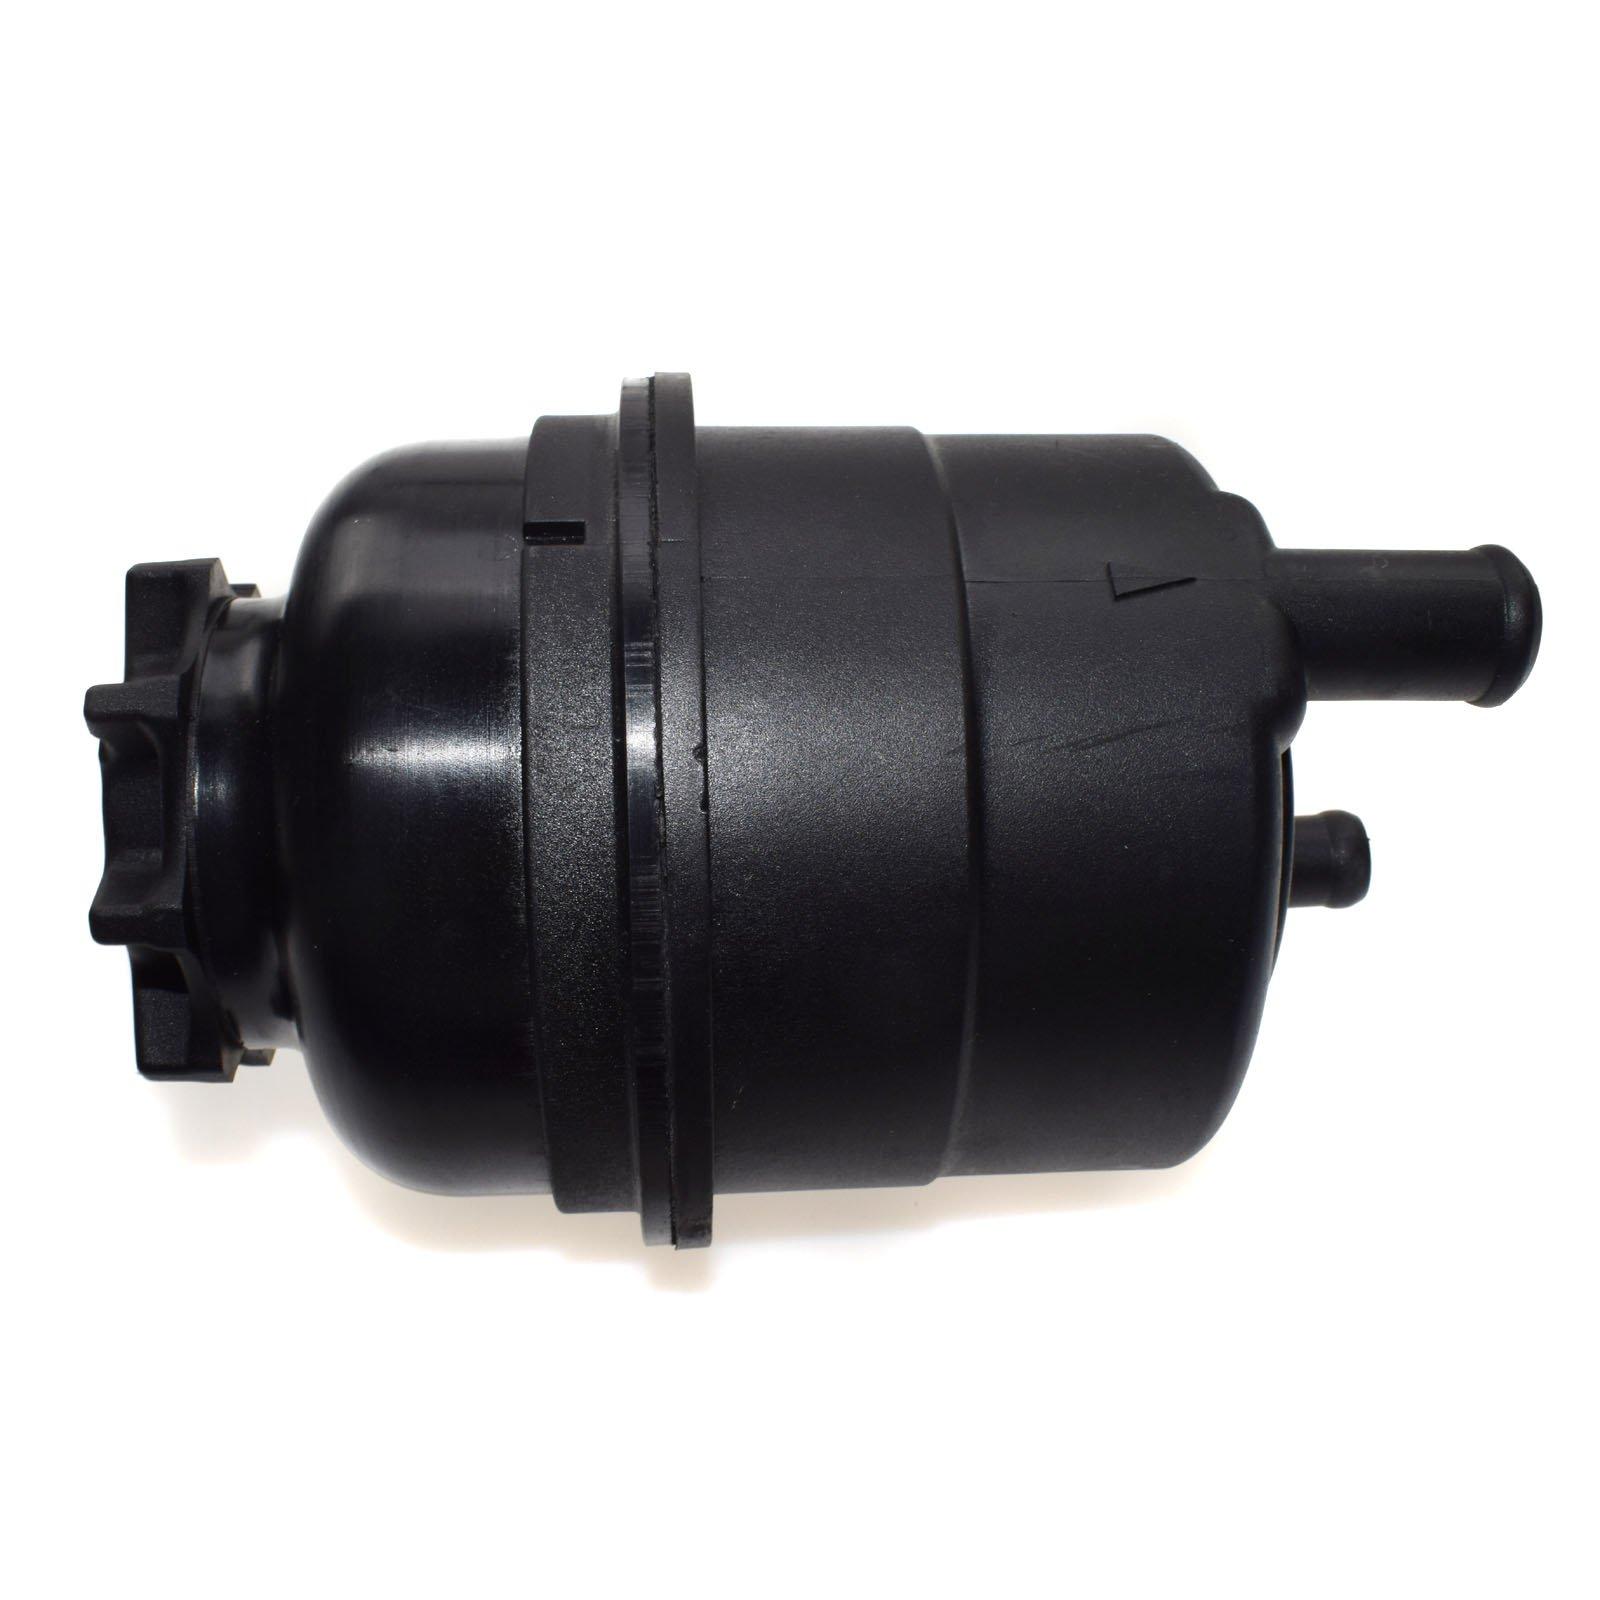 Power Steering Pump Fluid Reservoir Tank 32411097164 32416851217 NEW FOR BMW 528i 550i 650i 525i X3 X5